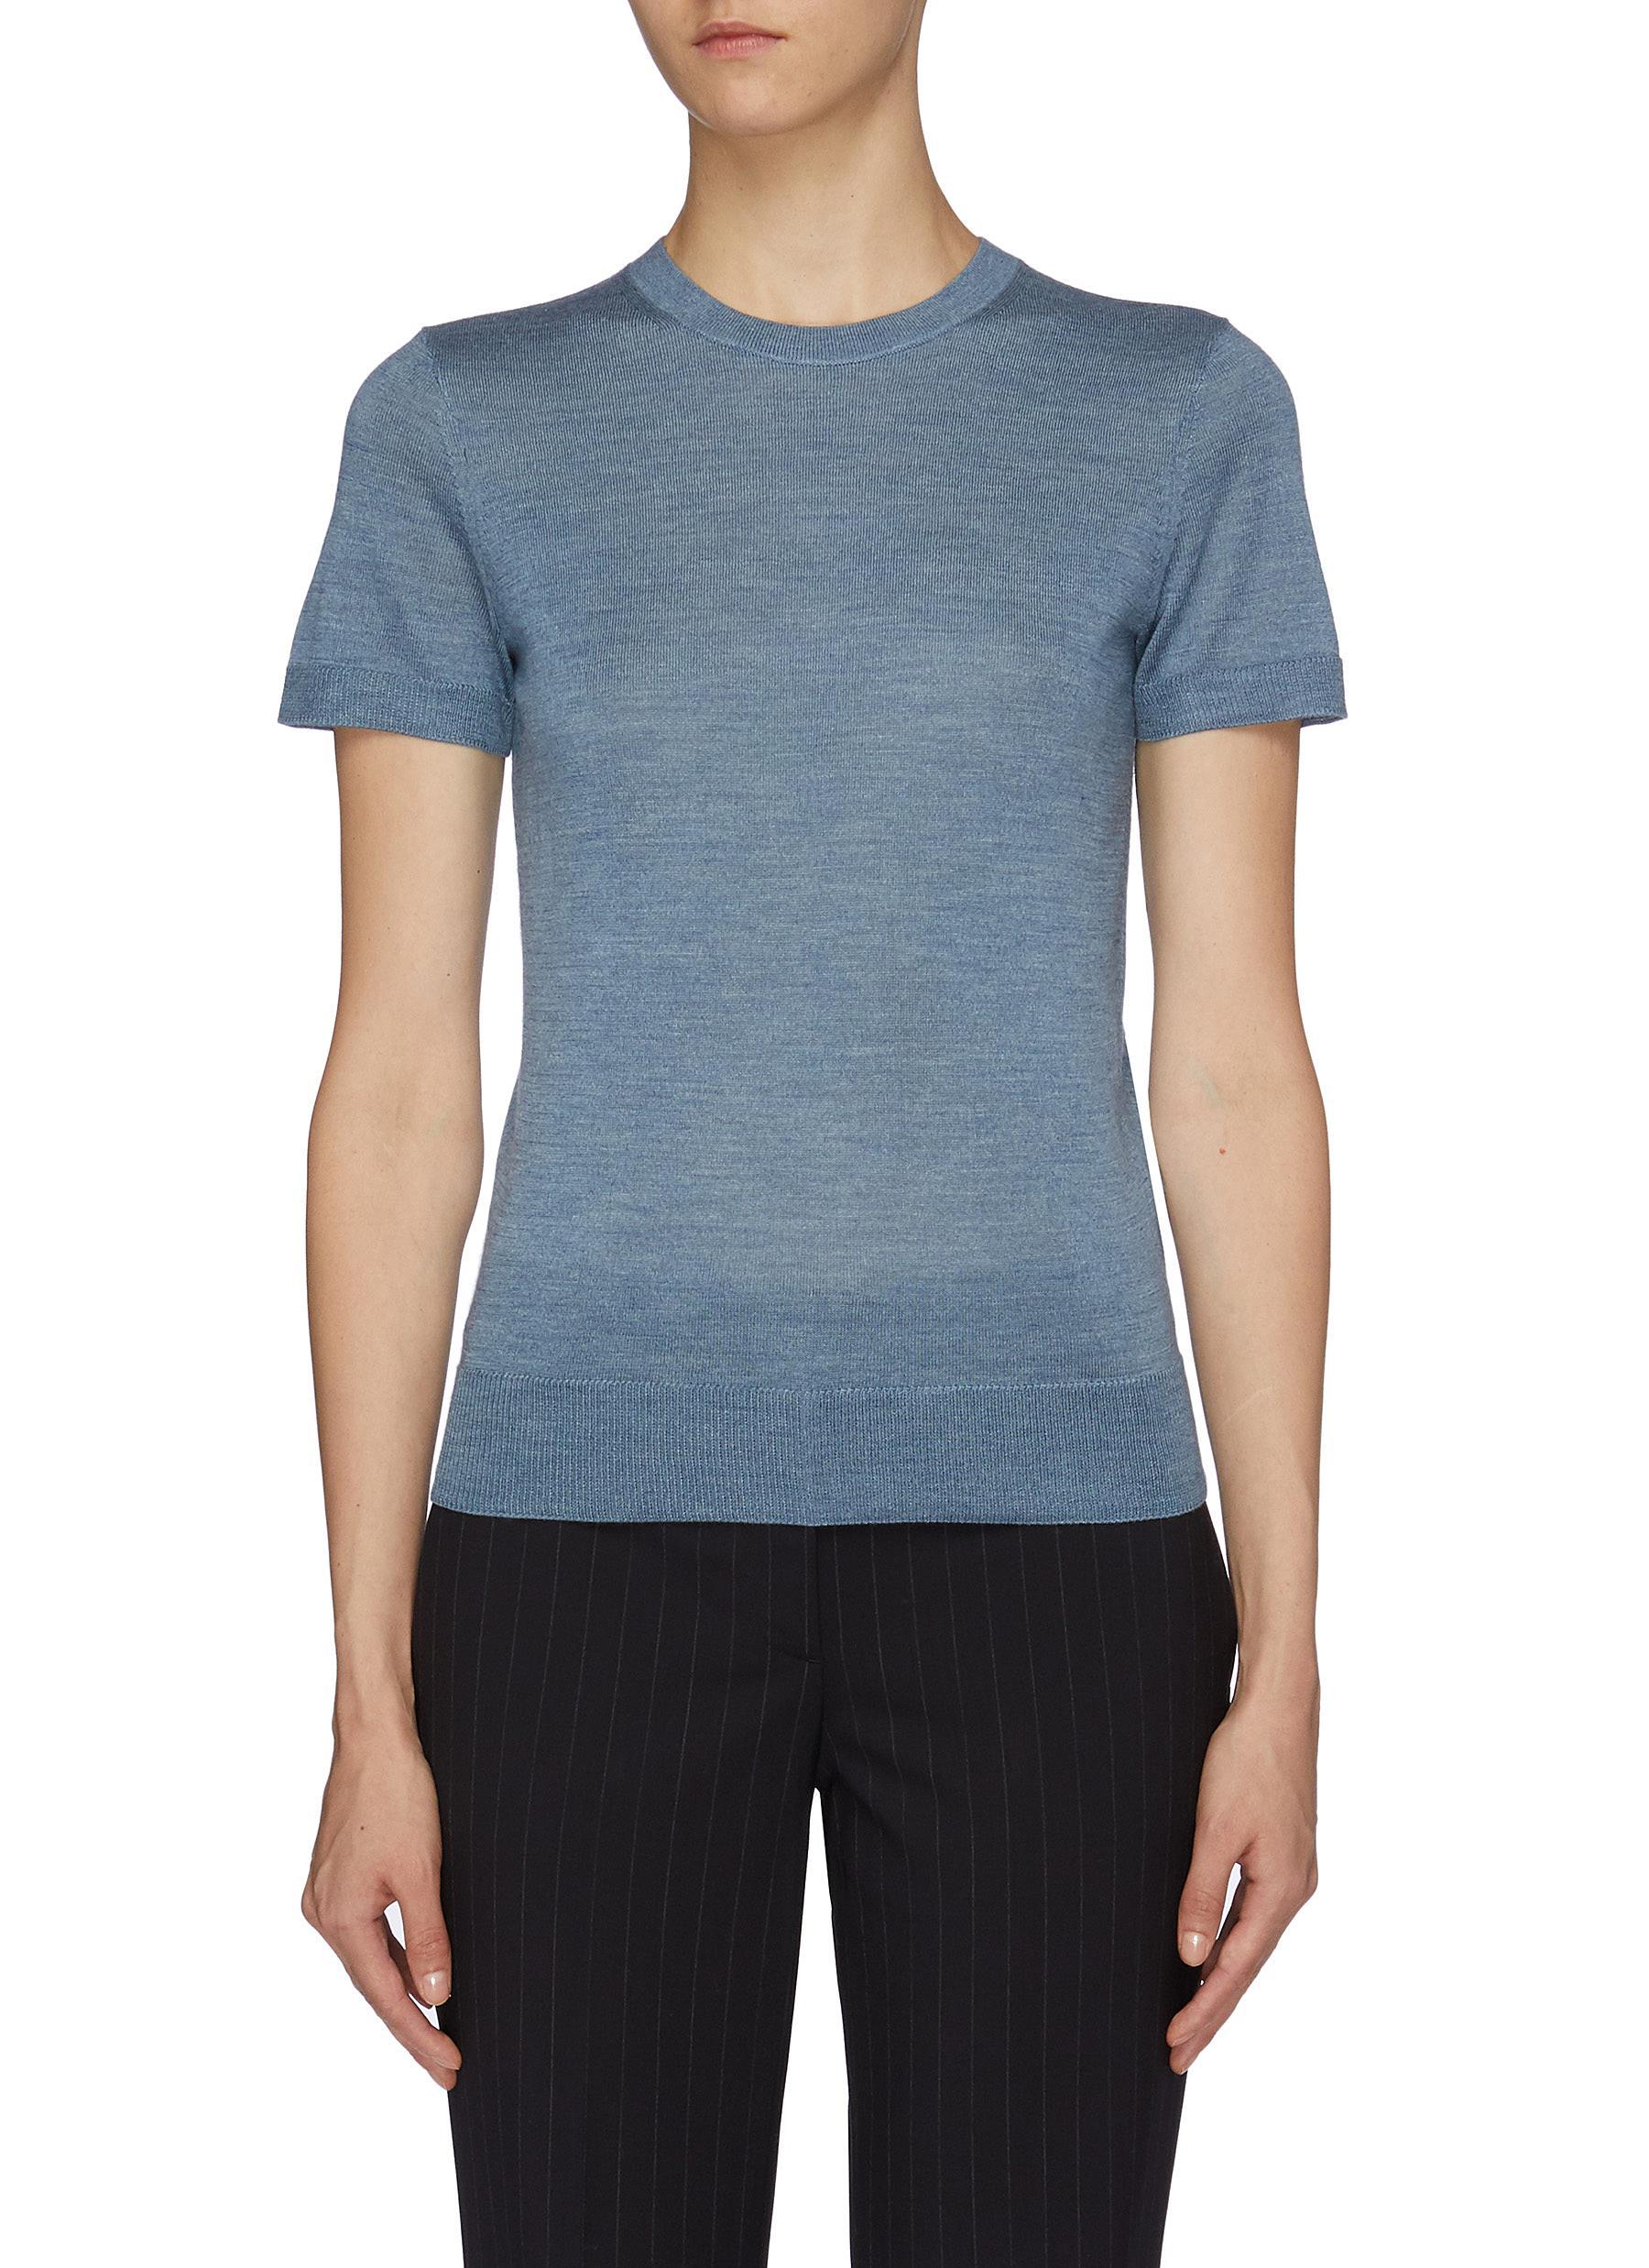 Silk blend knit T-shirt by Theory